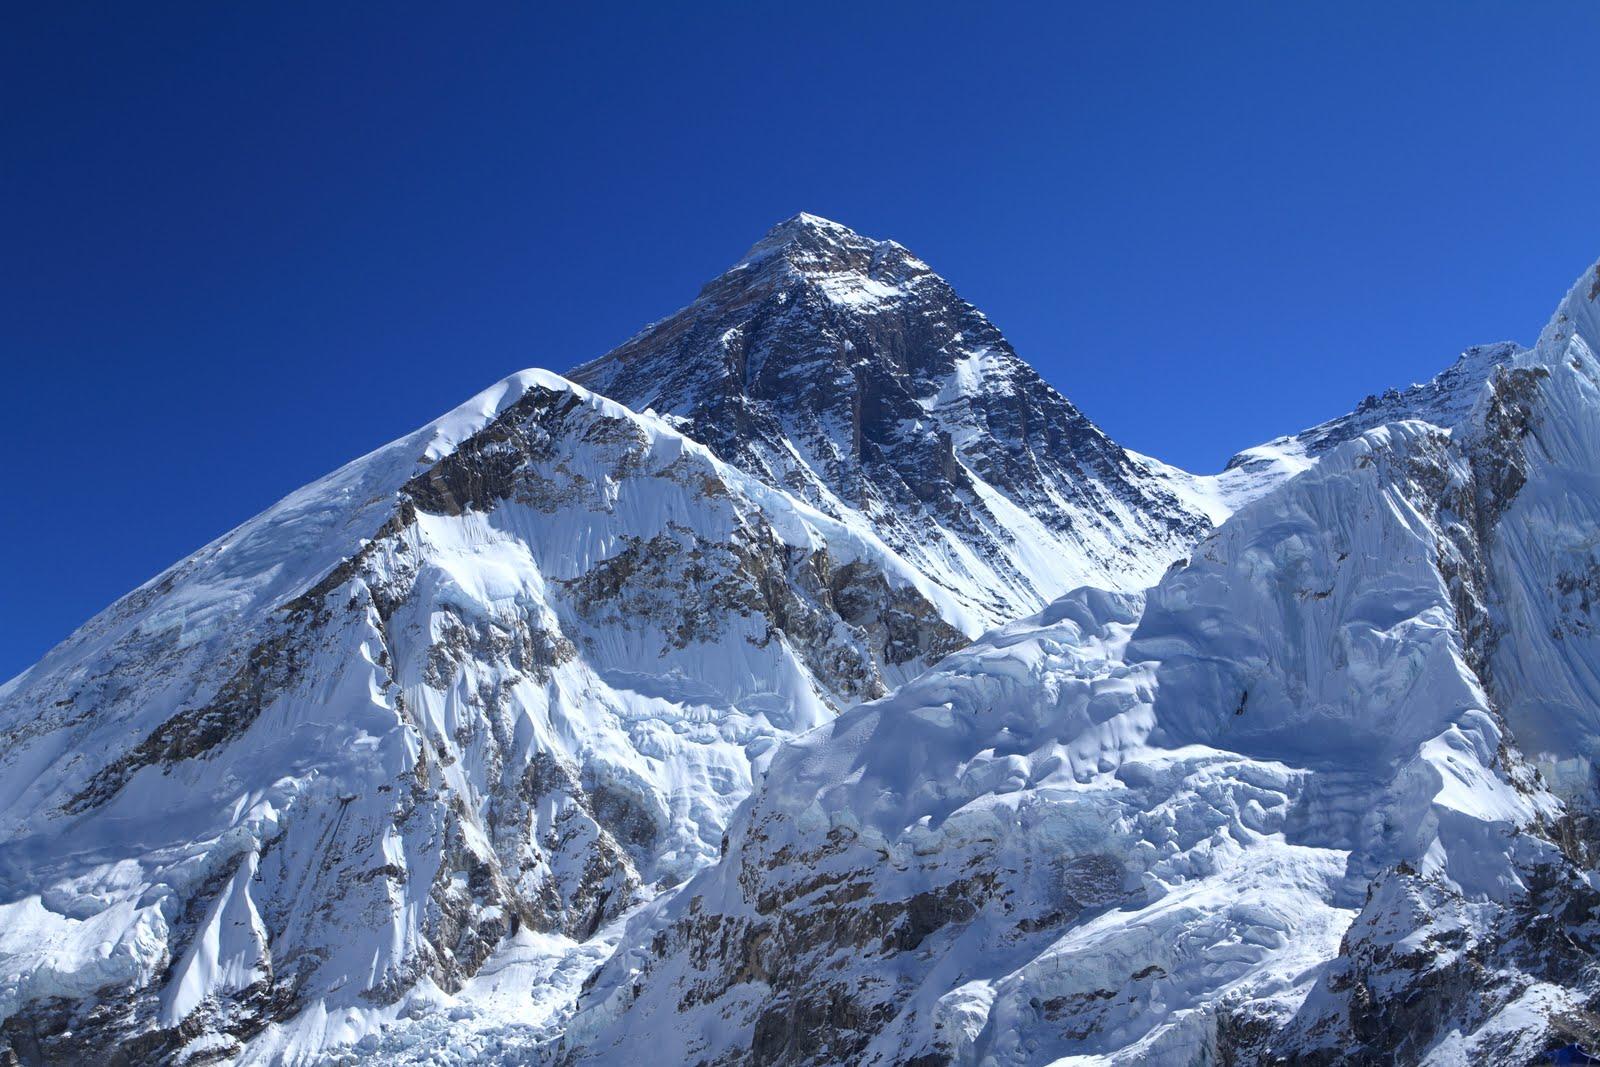 Free Download Mount Everest From Above Wallpaper 1600x1067 For Your Desktop Mobile Tablet Explore 71 Mt Everest Wallpaper Mount Everest Wallpaper Hd